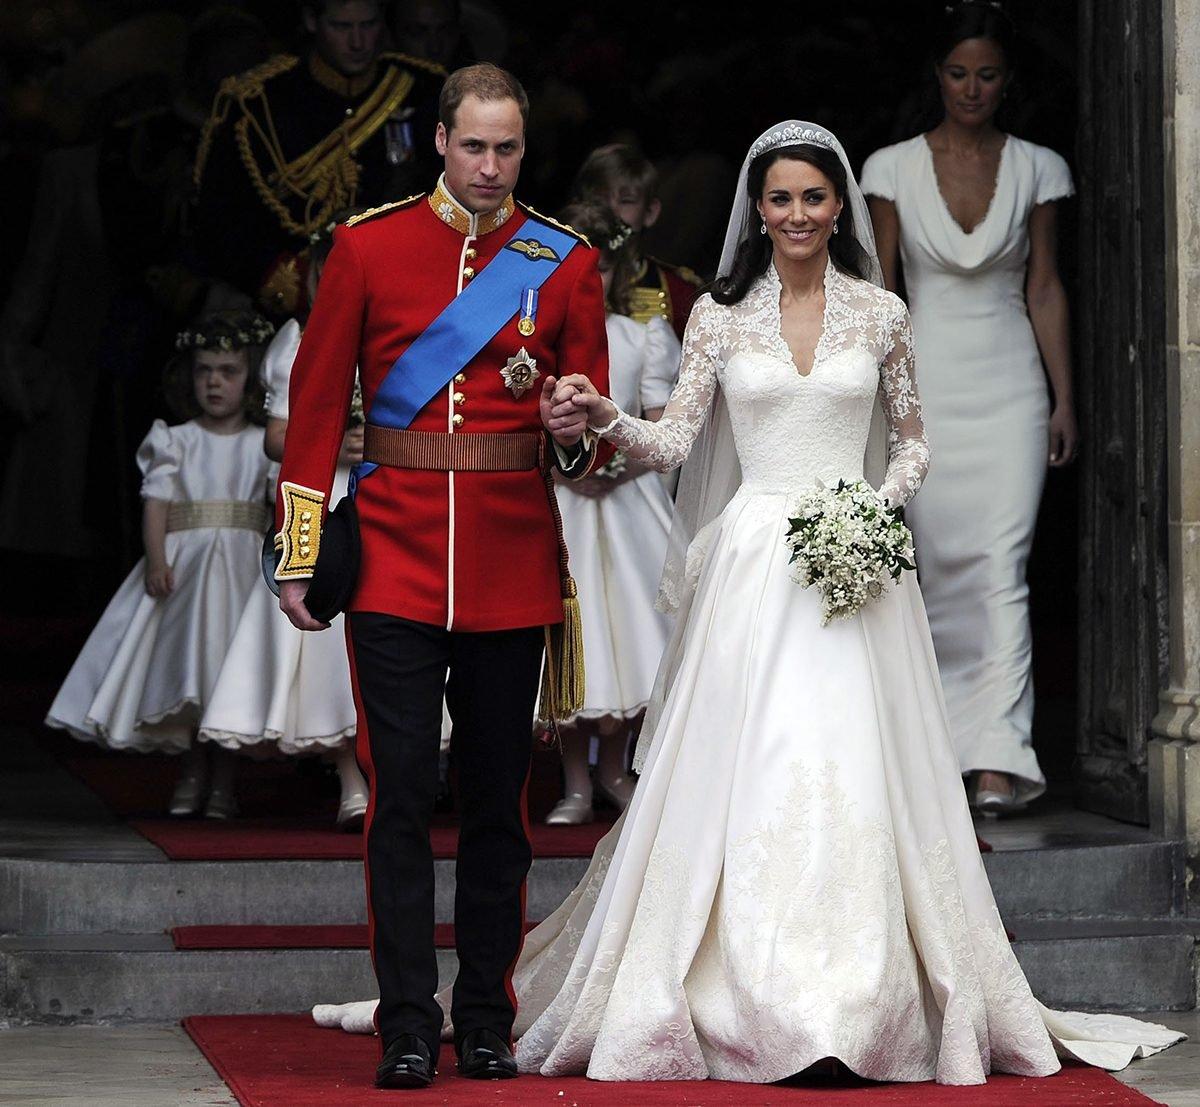 Prince Charles and Princess Diana's wedding - William and Kate's wedding